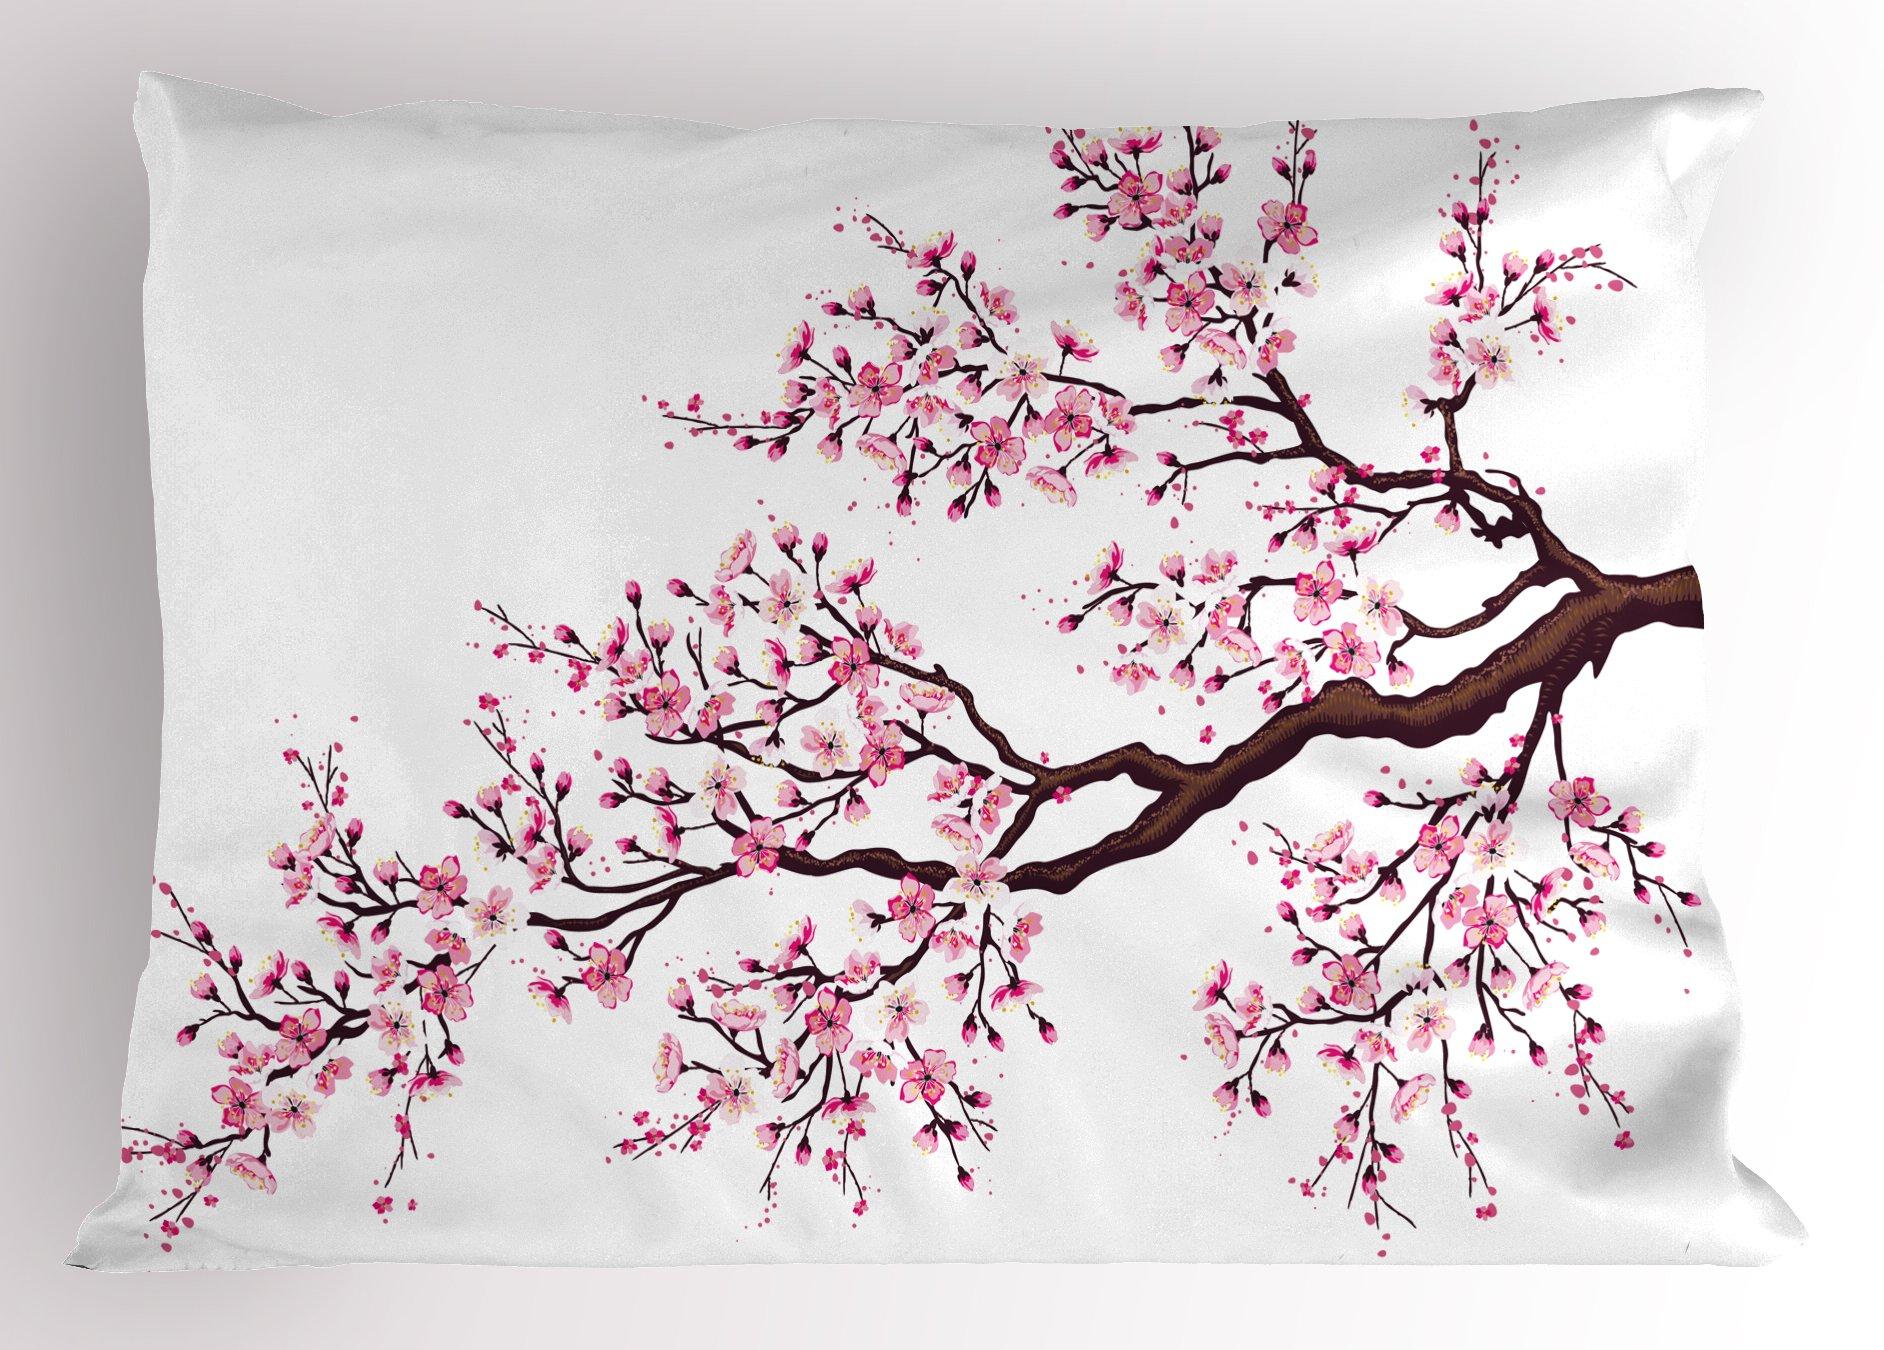 Ambesonne Japanese Pillow Sham, Branch of a Flourishing Sakura Tree Flowers Cherry Blossoms Spring Theme Art, Decorative Standard Queen Size Printed Pillowcase, 30 X 20 inches, Pink Dark Brown